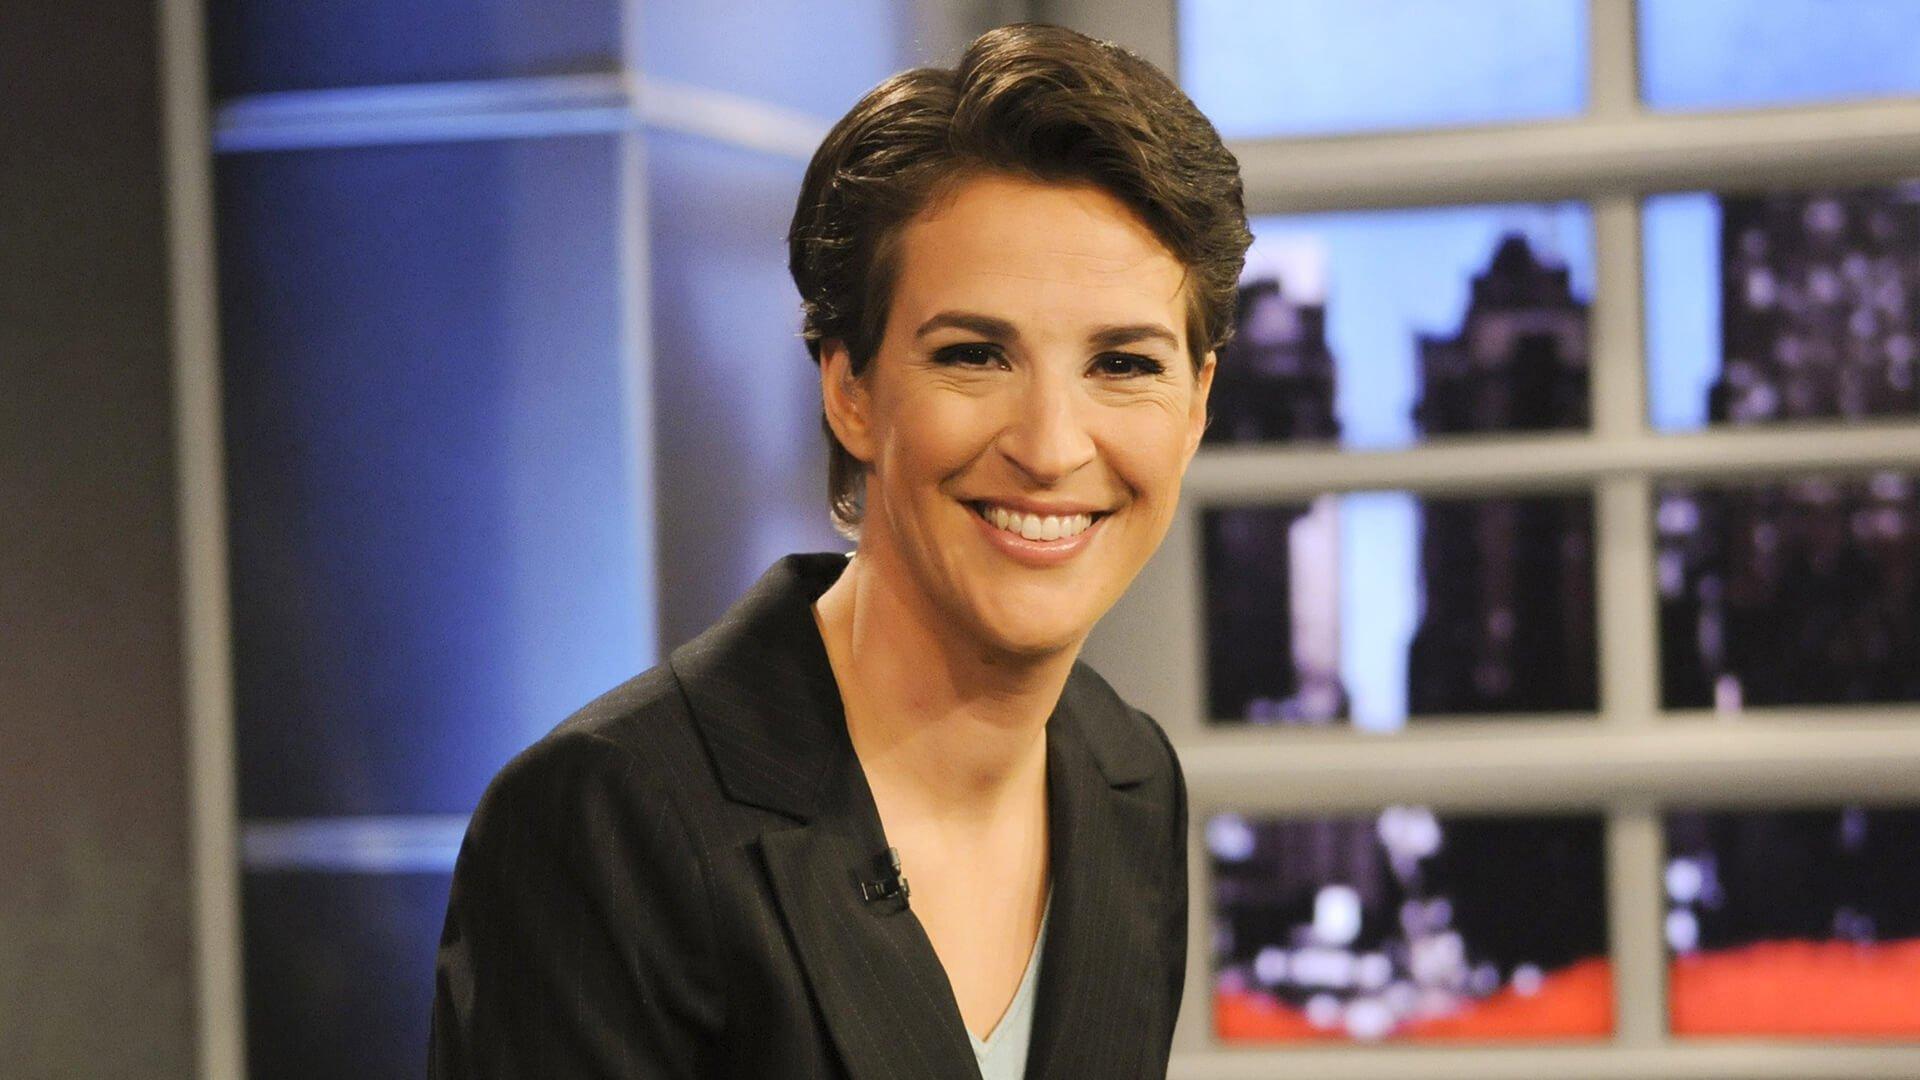 How Rich Is MSNBC Host Rachel Maddow?